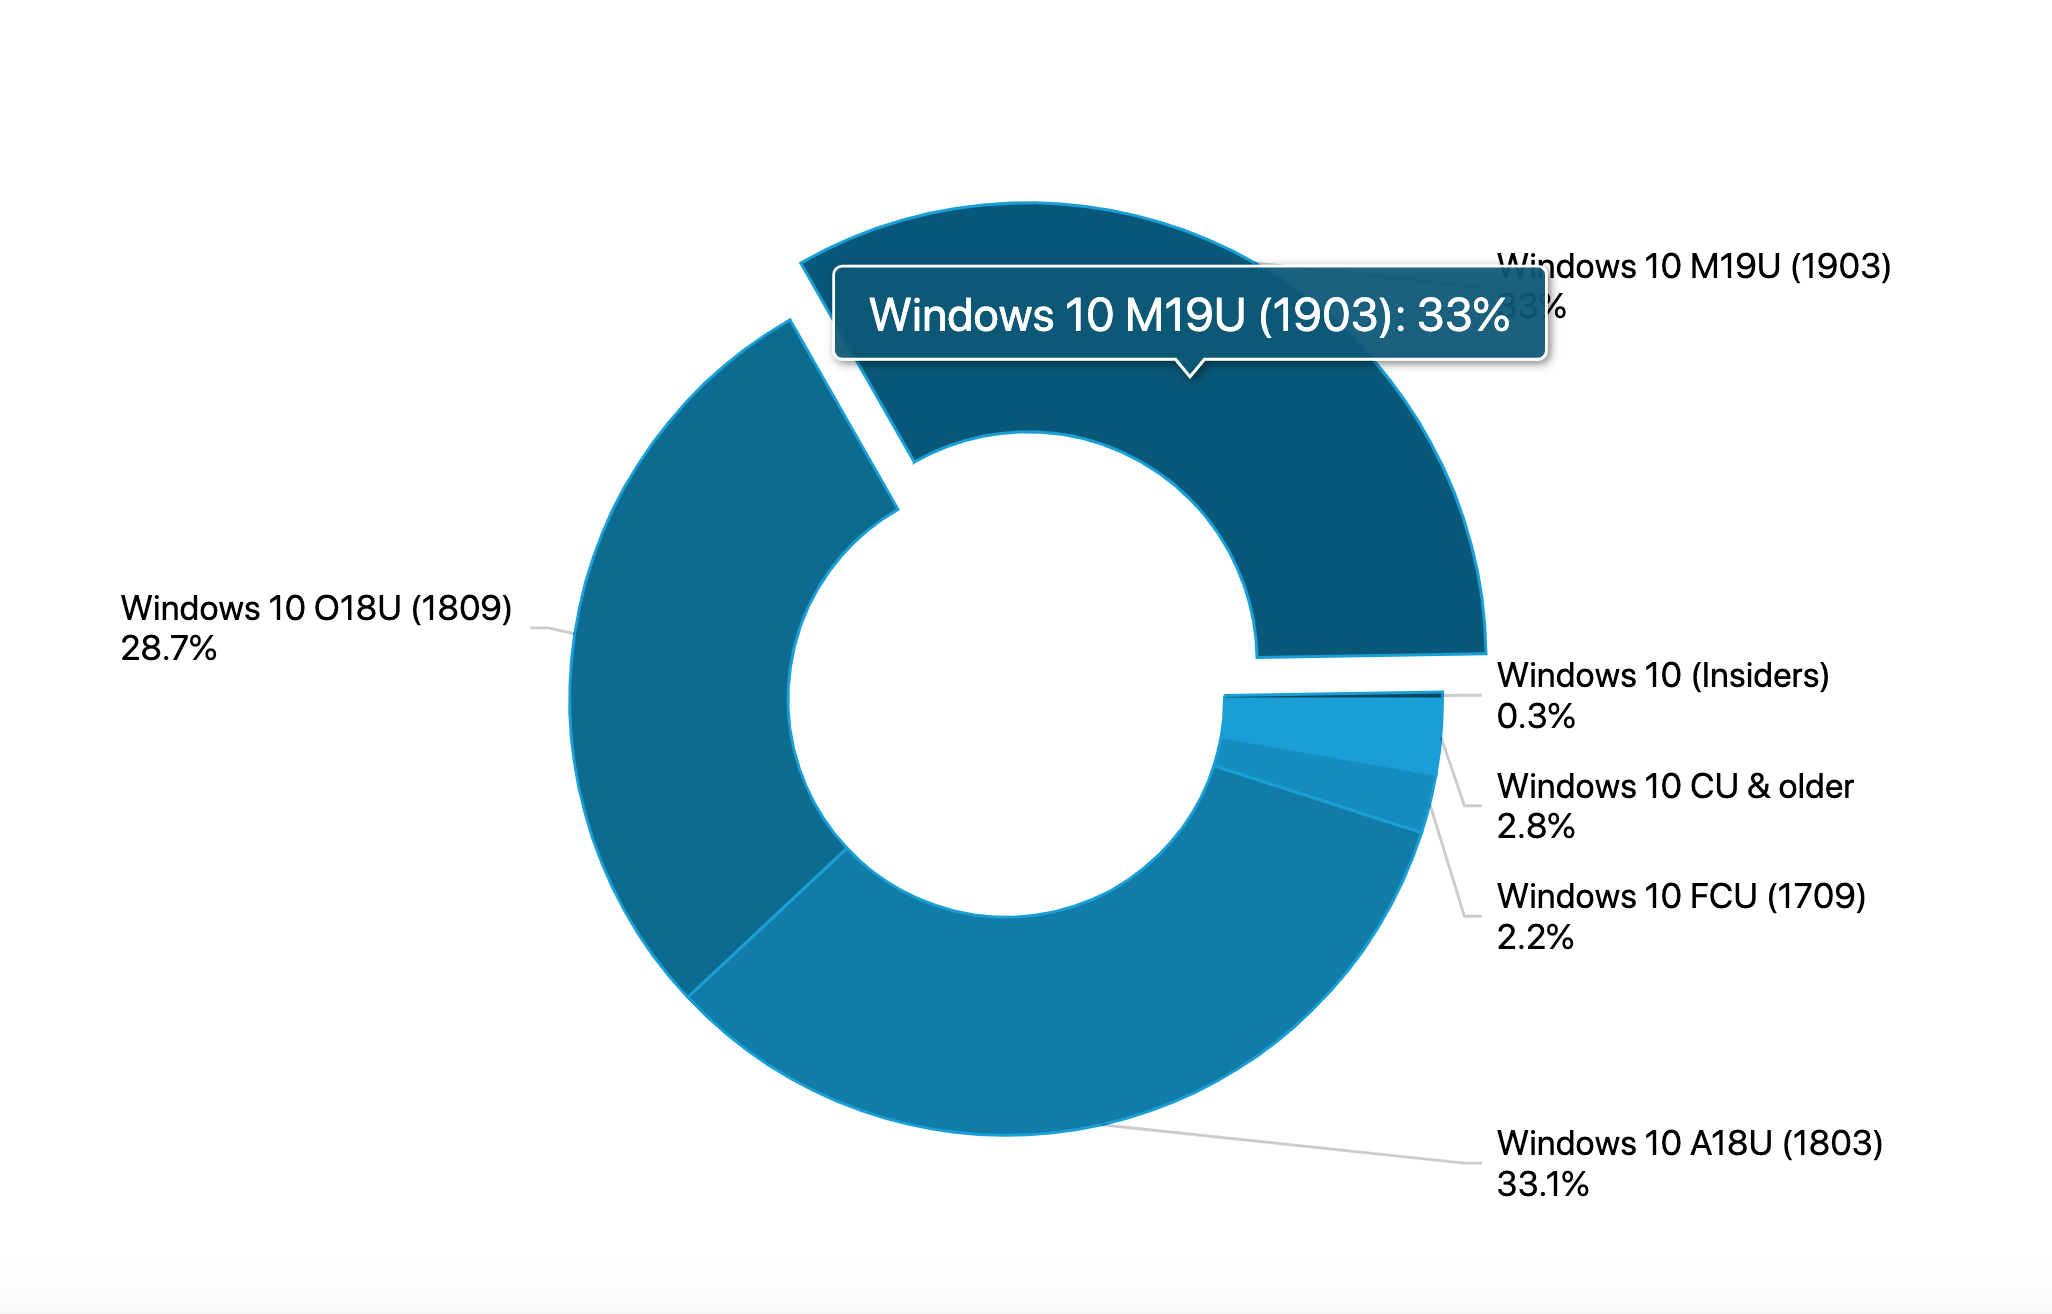 windows 10 may 2019 update adoption rate